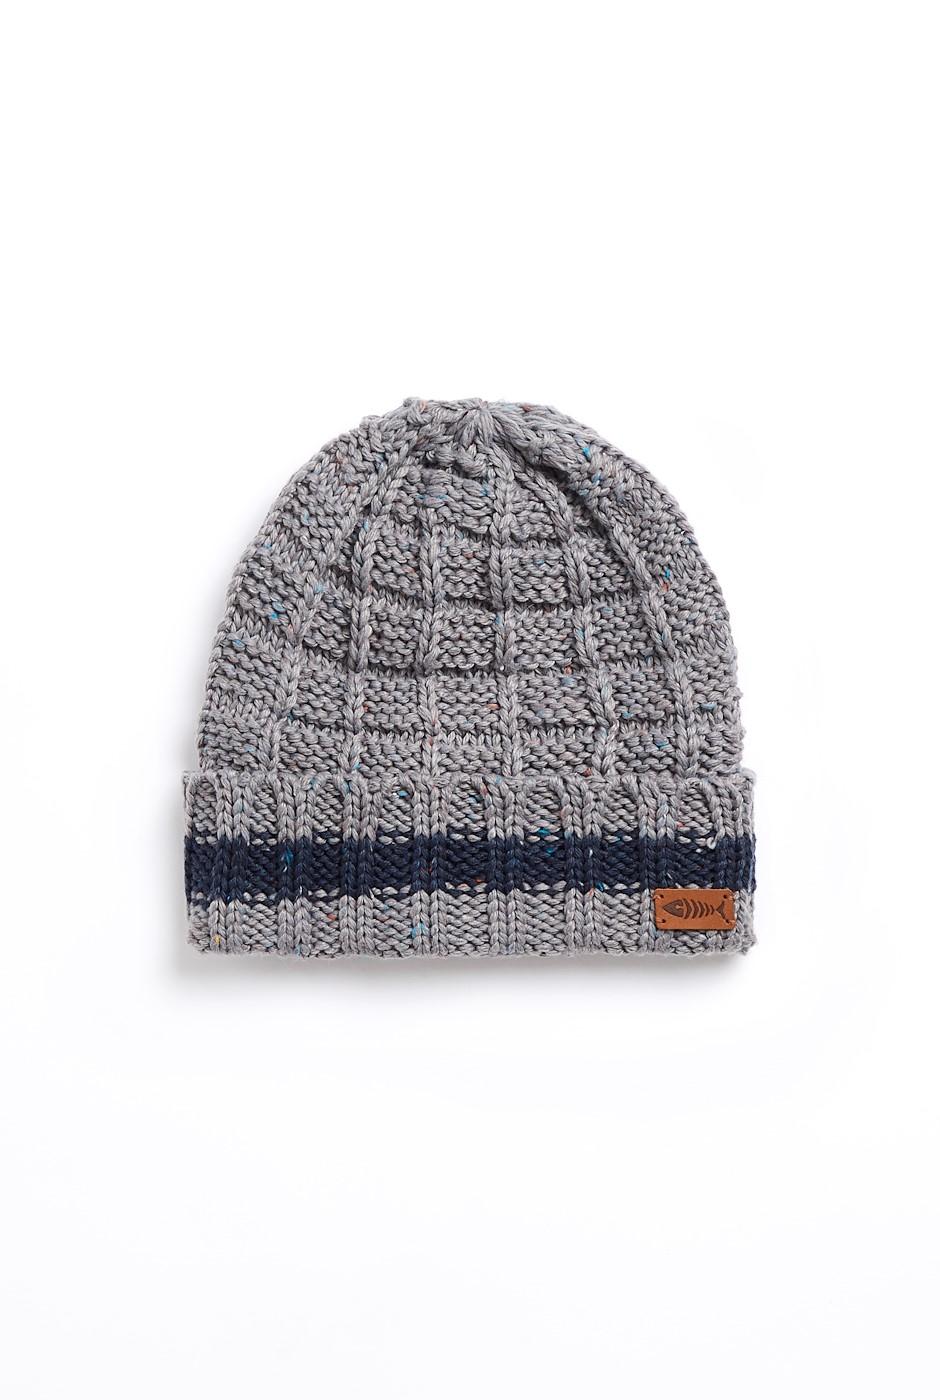 Fernley Eco Nepp Textured Stitch Beanie Frost Grey